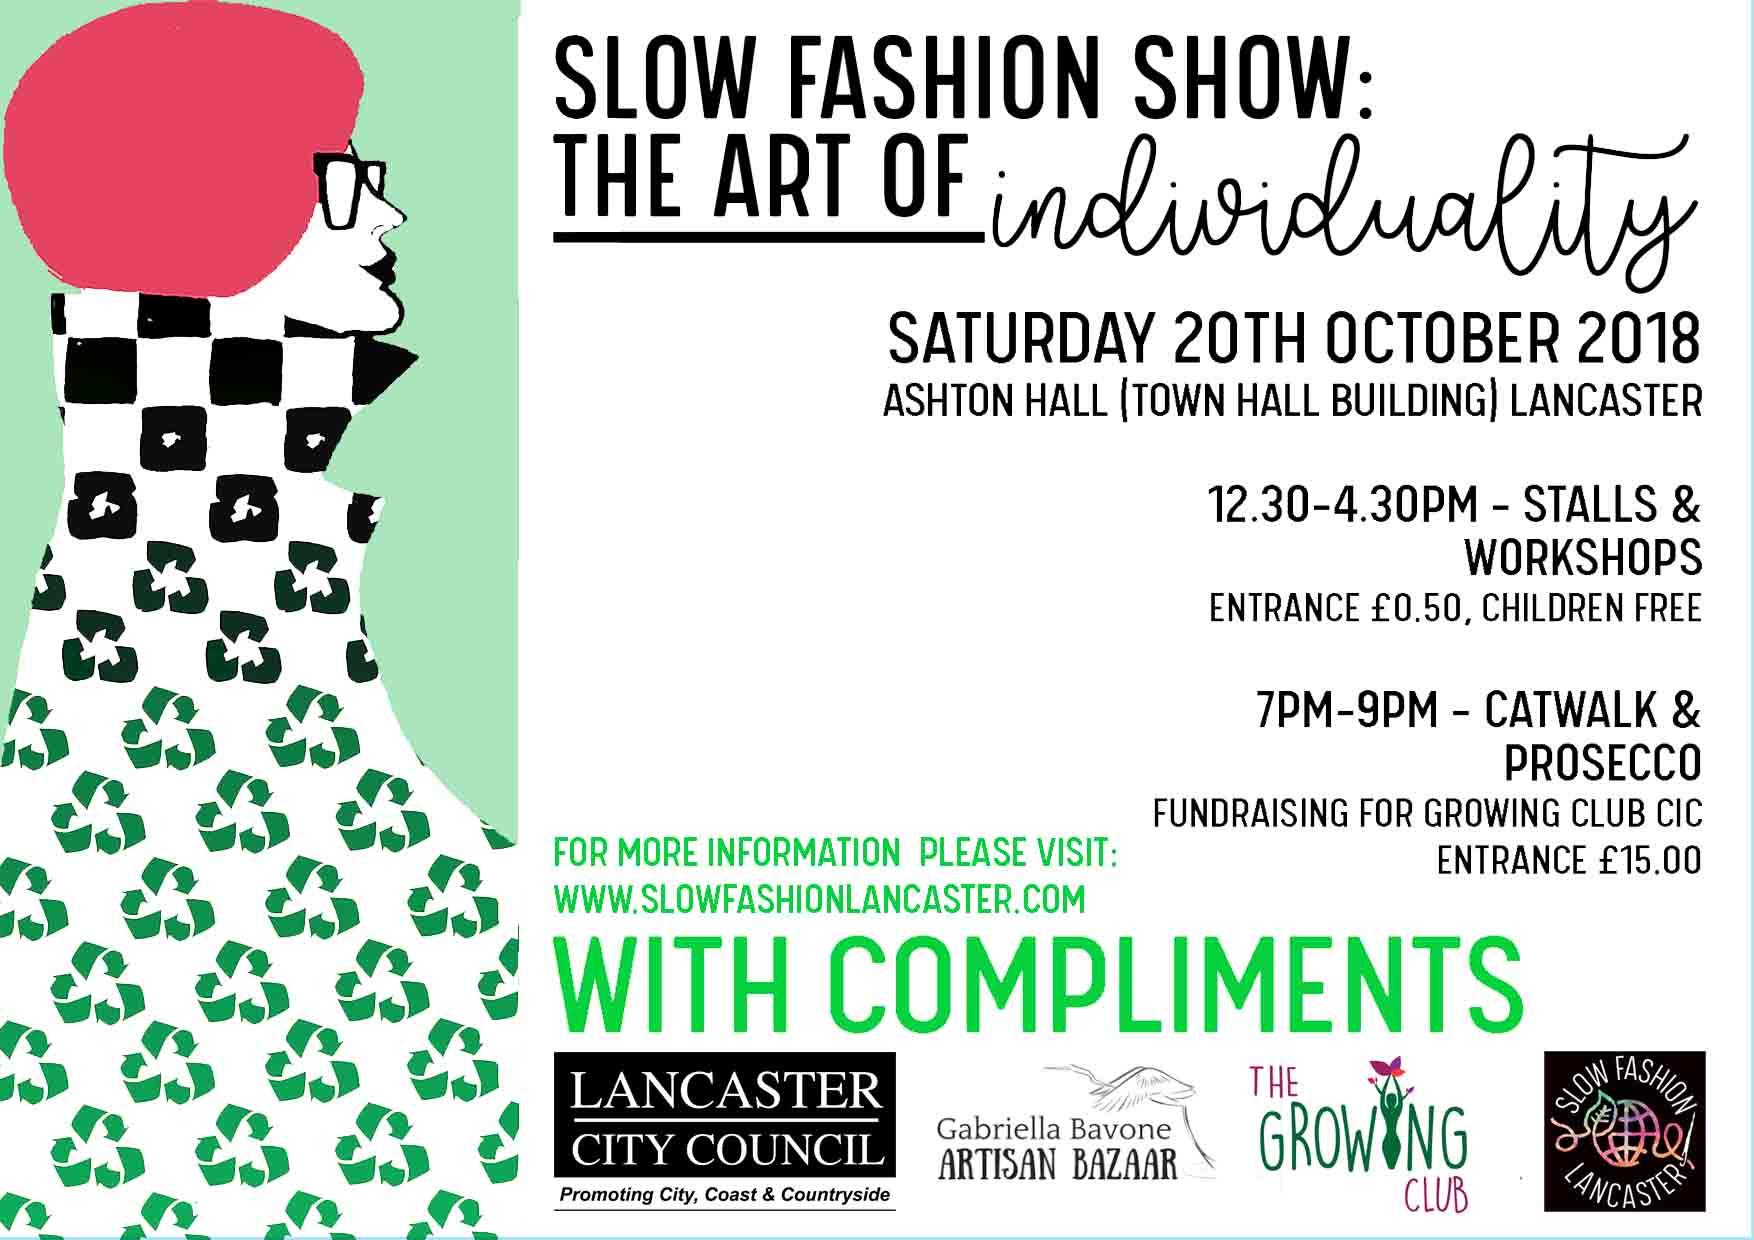 Slow Fashion Show A5 leaflet